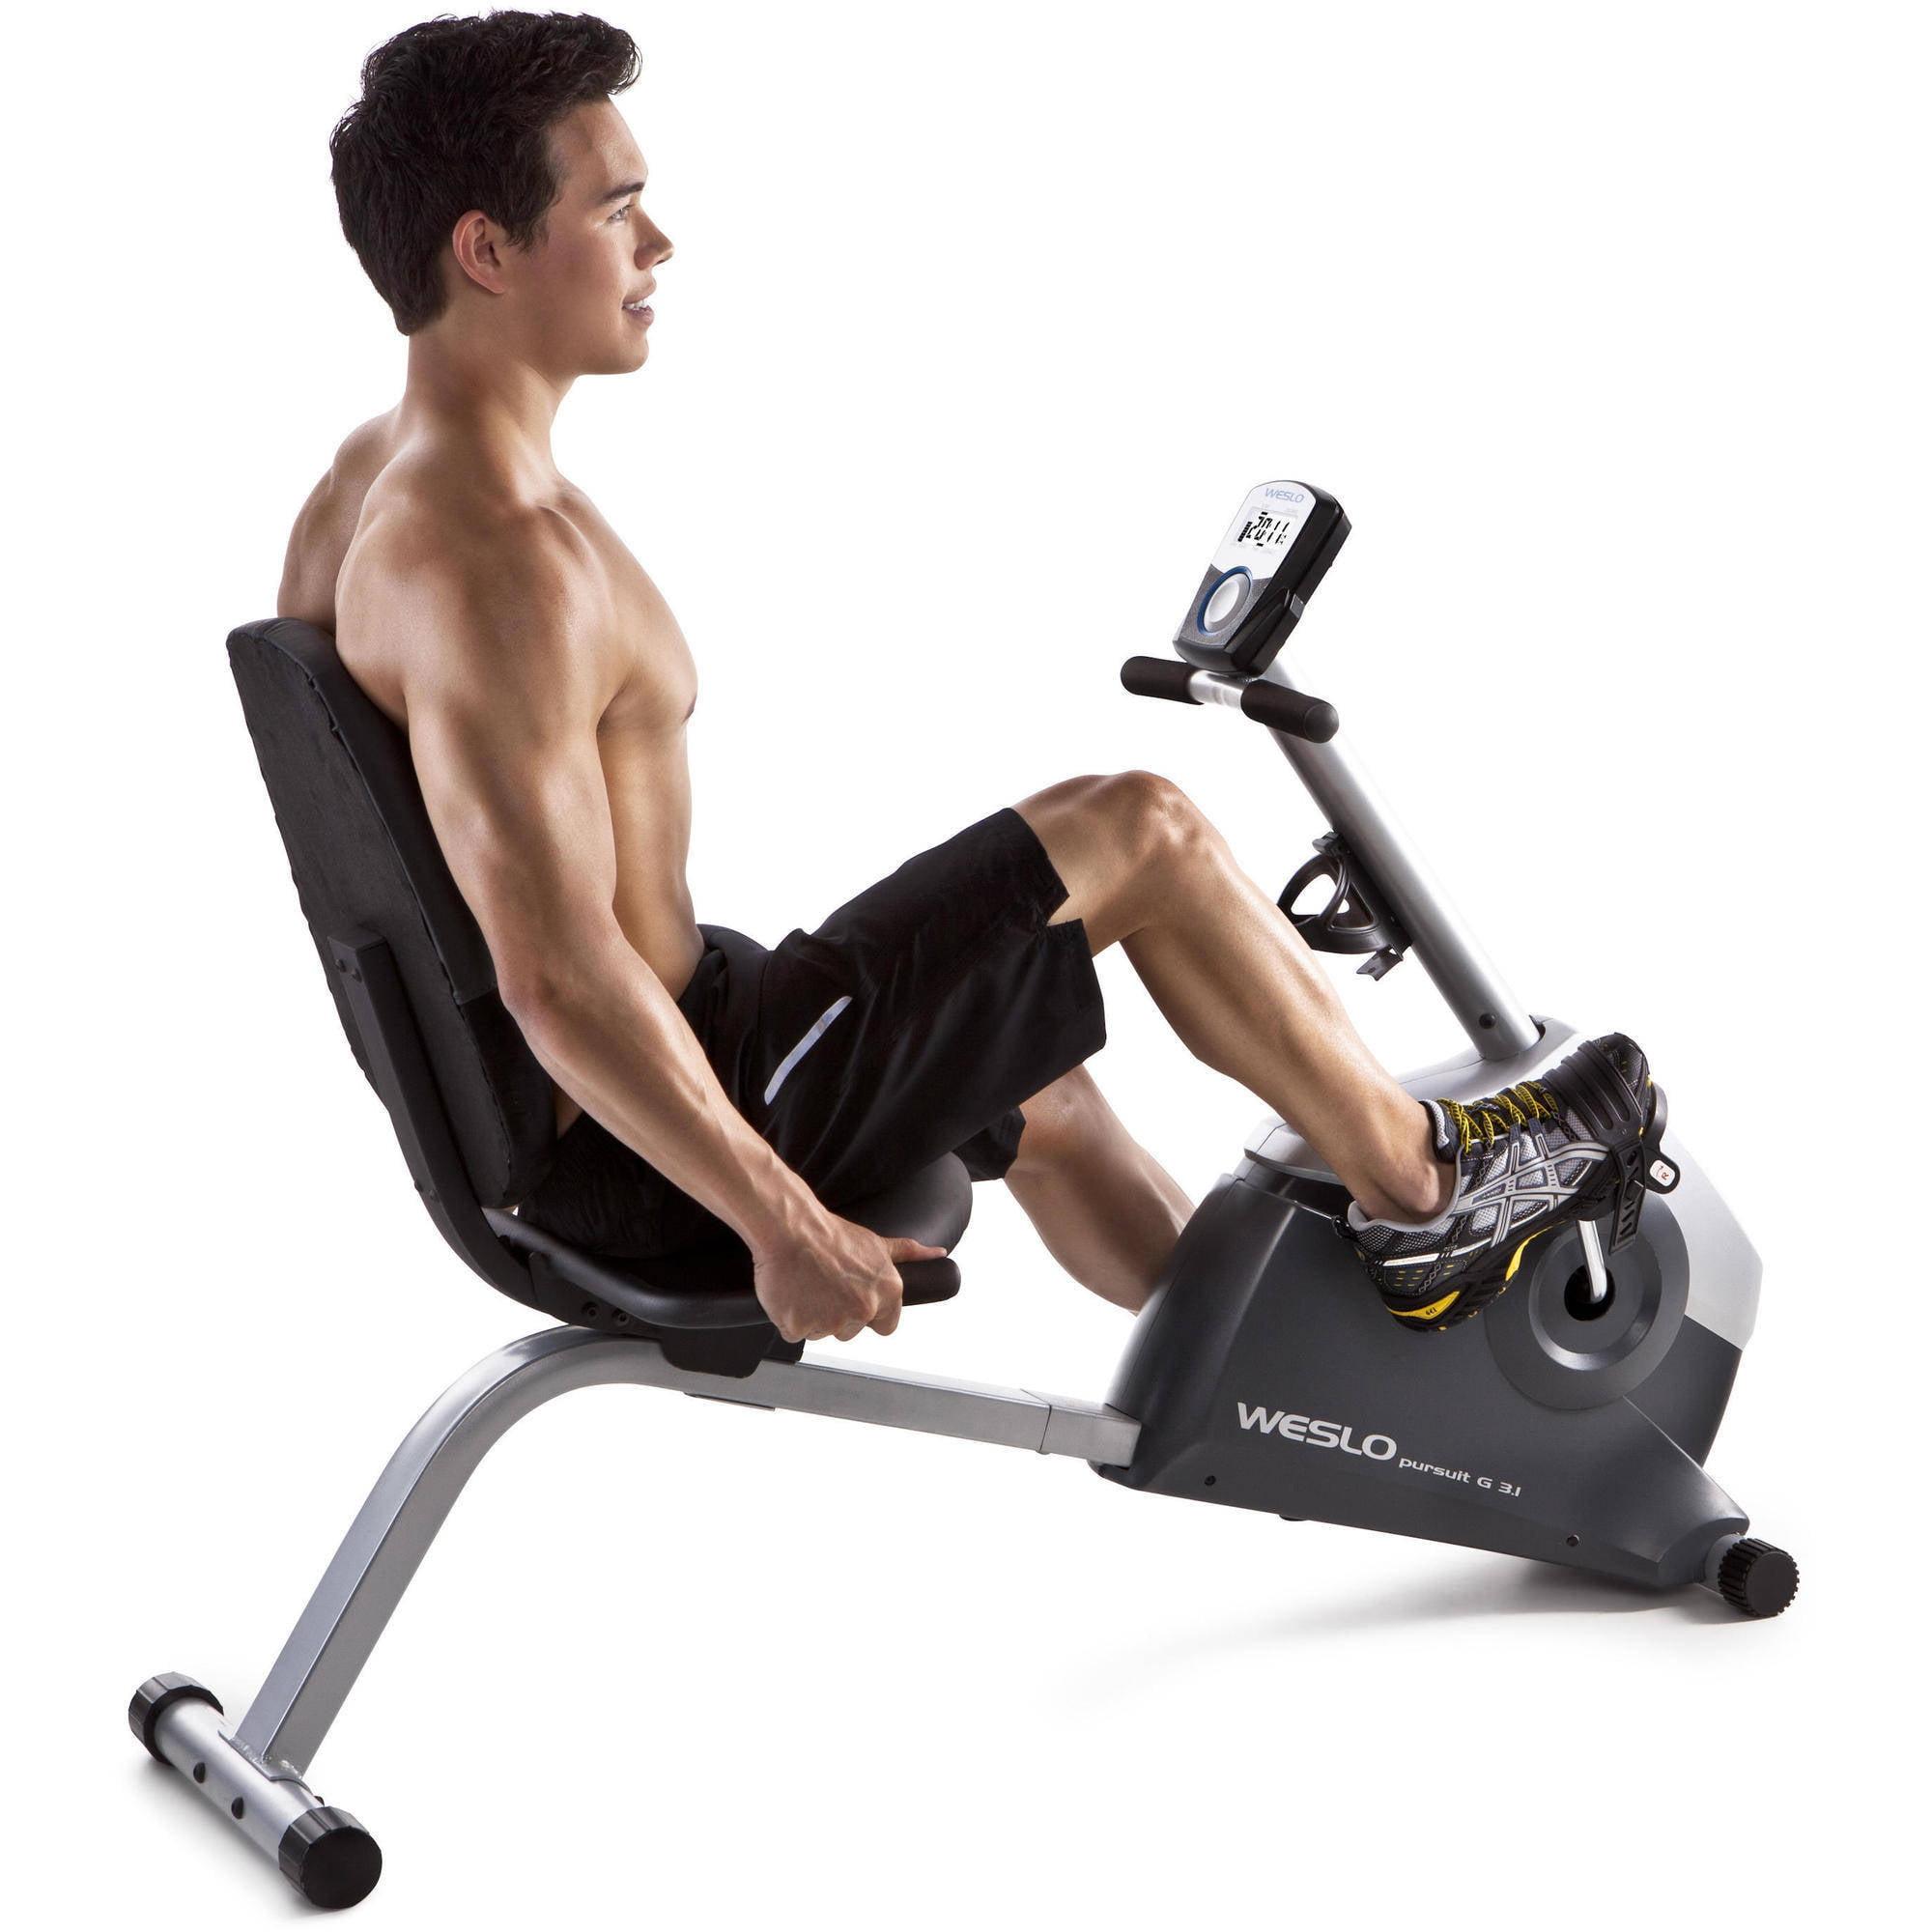 Weslo Pursuit G 3 1 Recumbent Exercise Bike